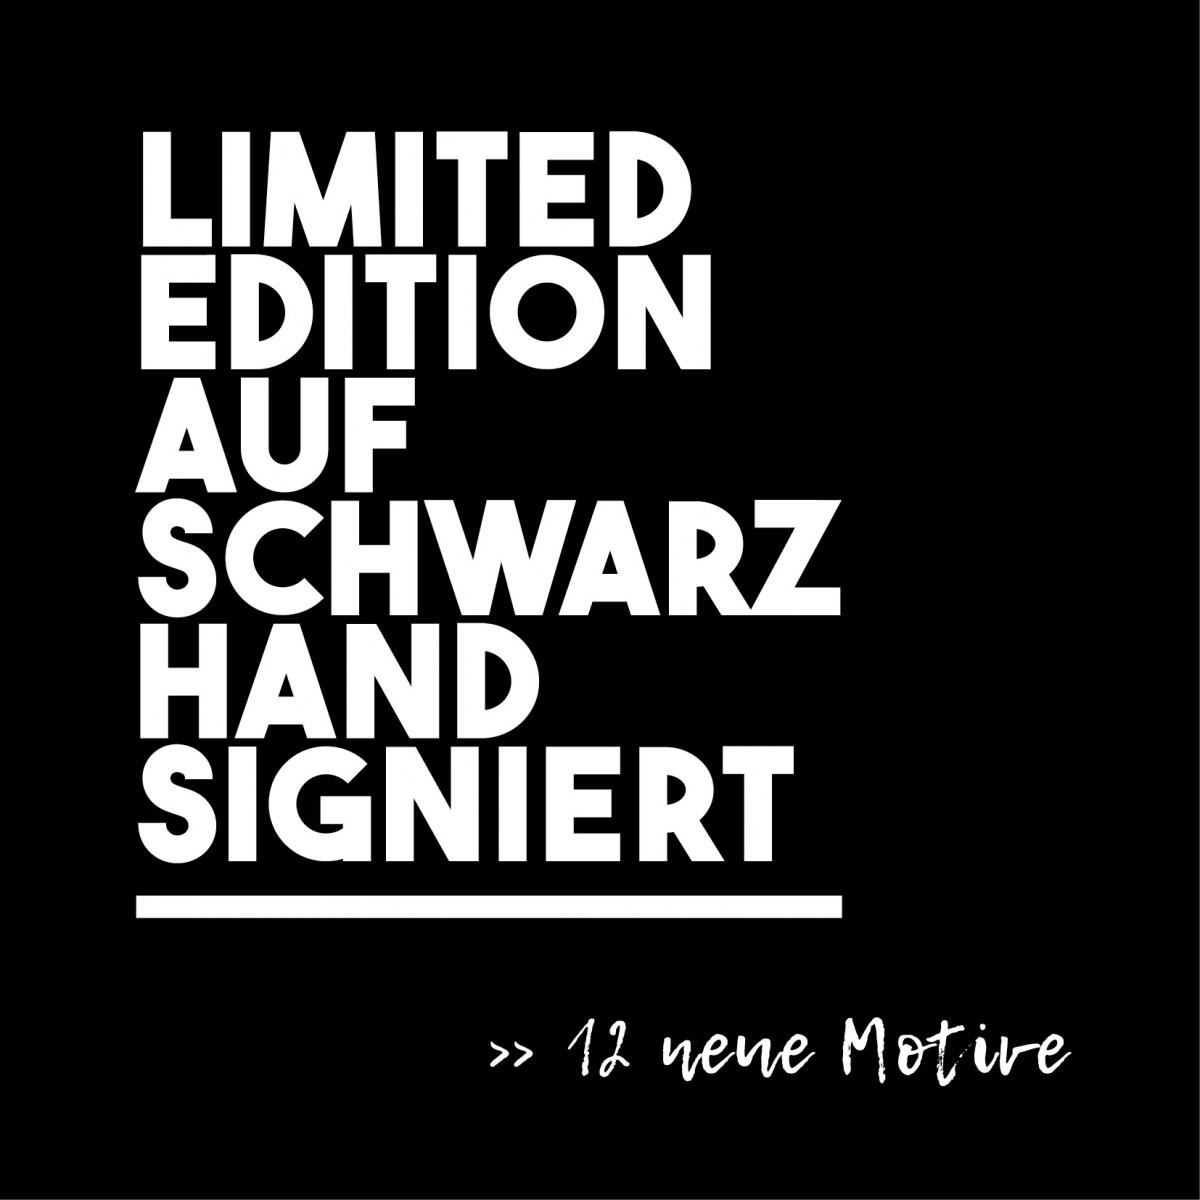 FrankfurterBubb UMS ECK Limited Edition  schwarz-weiß Foto-Kachel